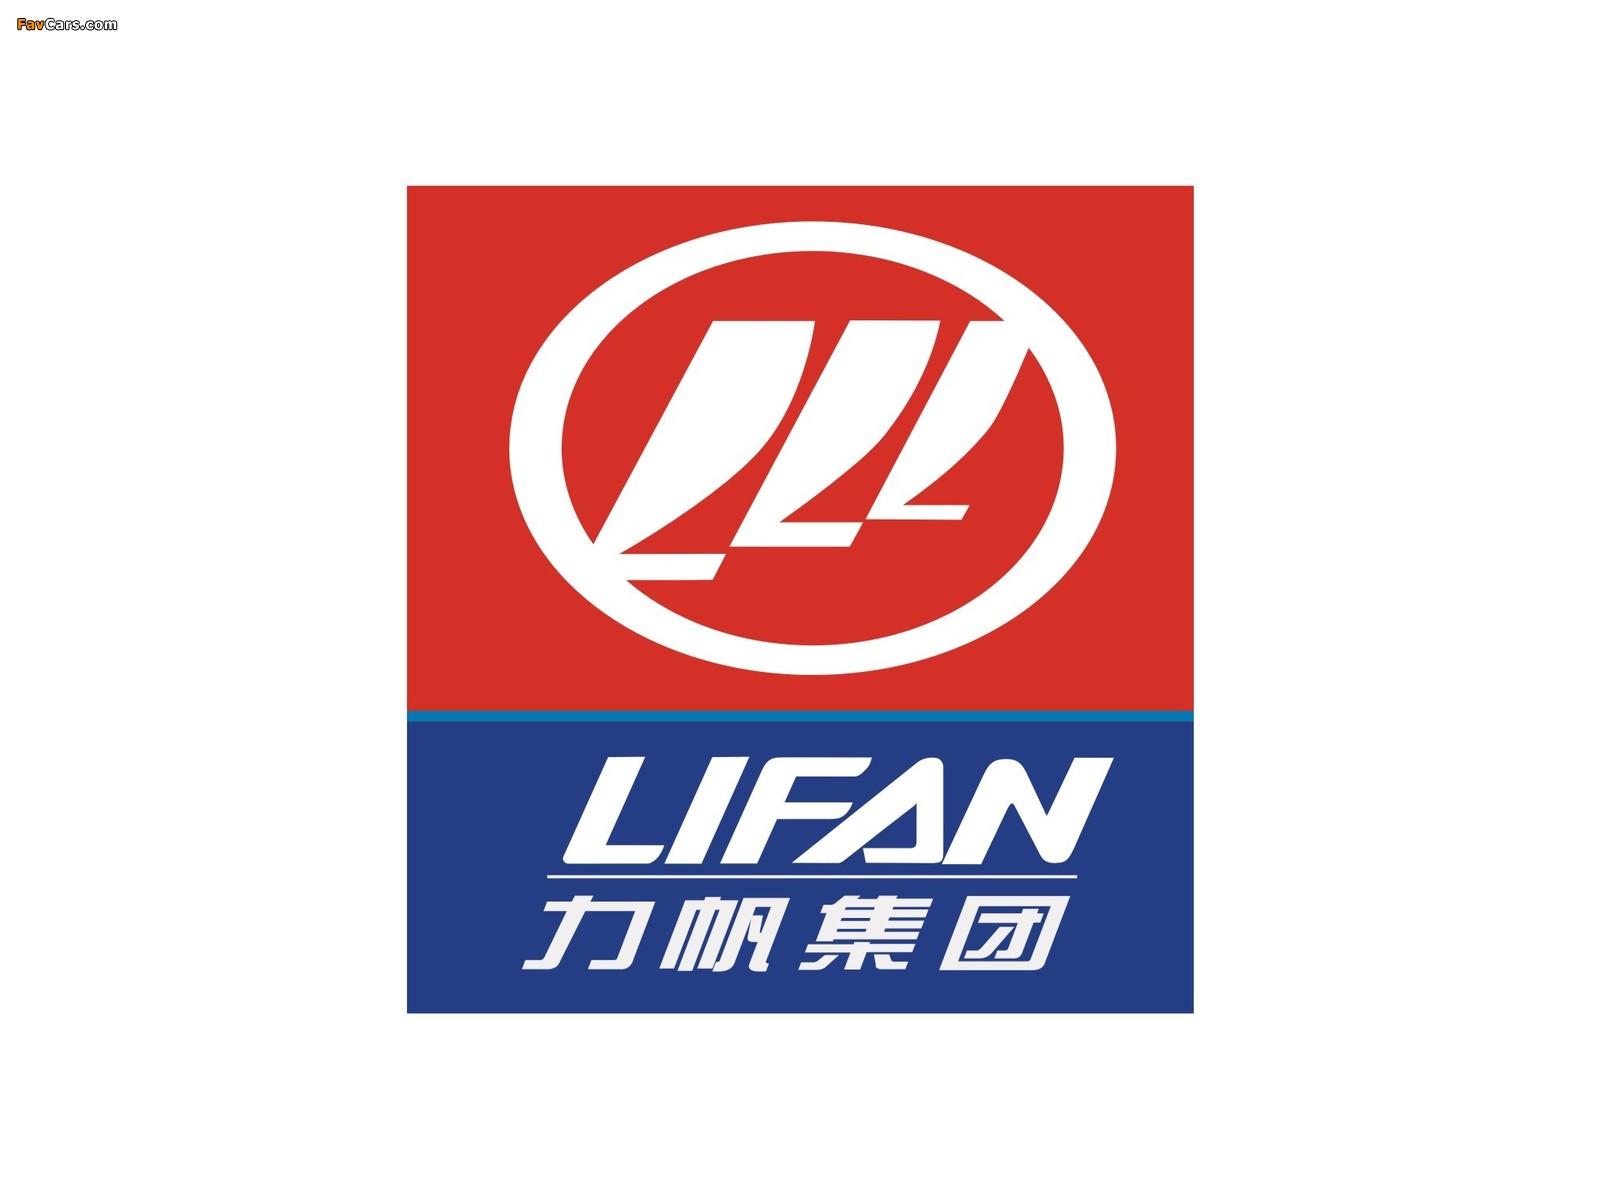 Lifan photos (1600 x 1200)